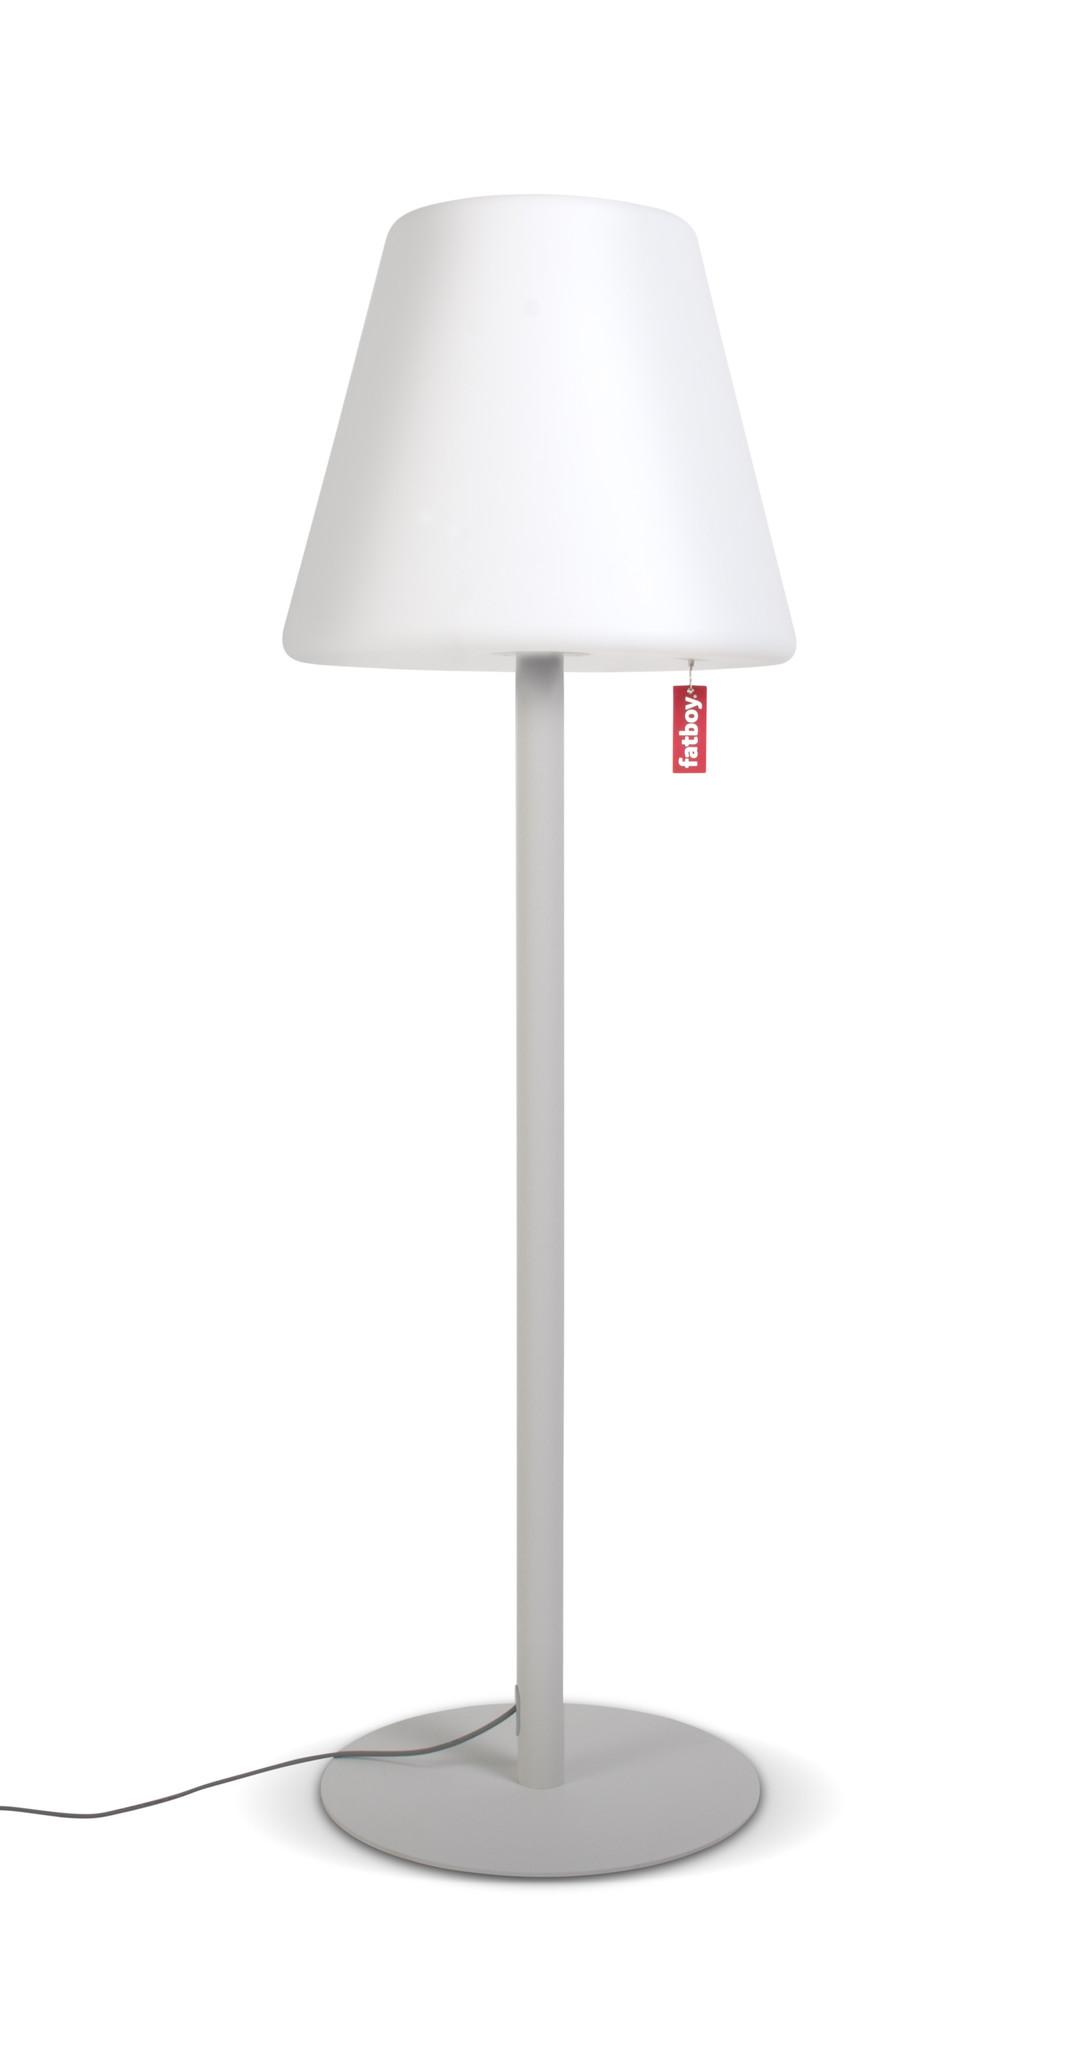 Fatboy Floor lamp Edison the Giant light grey